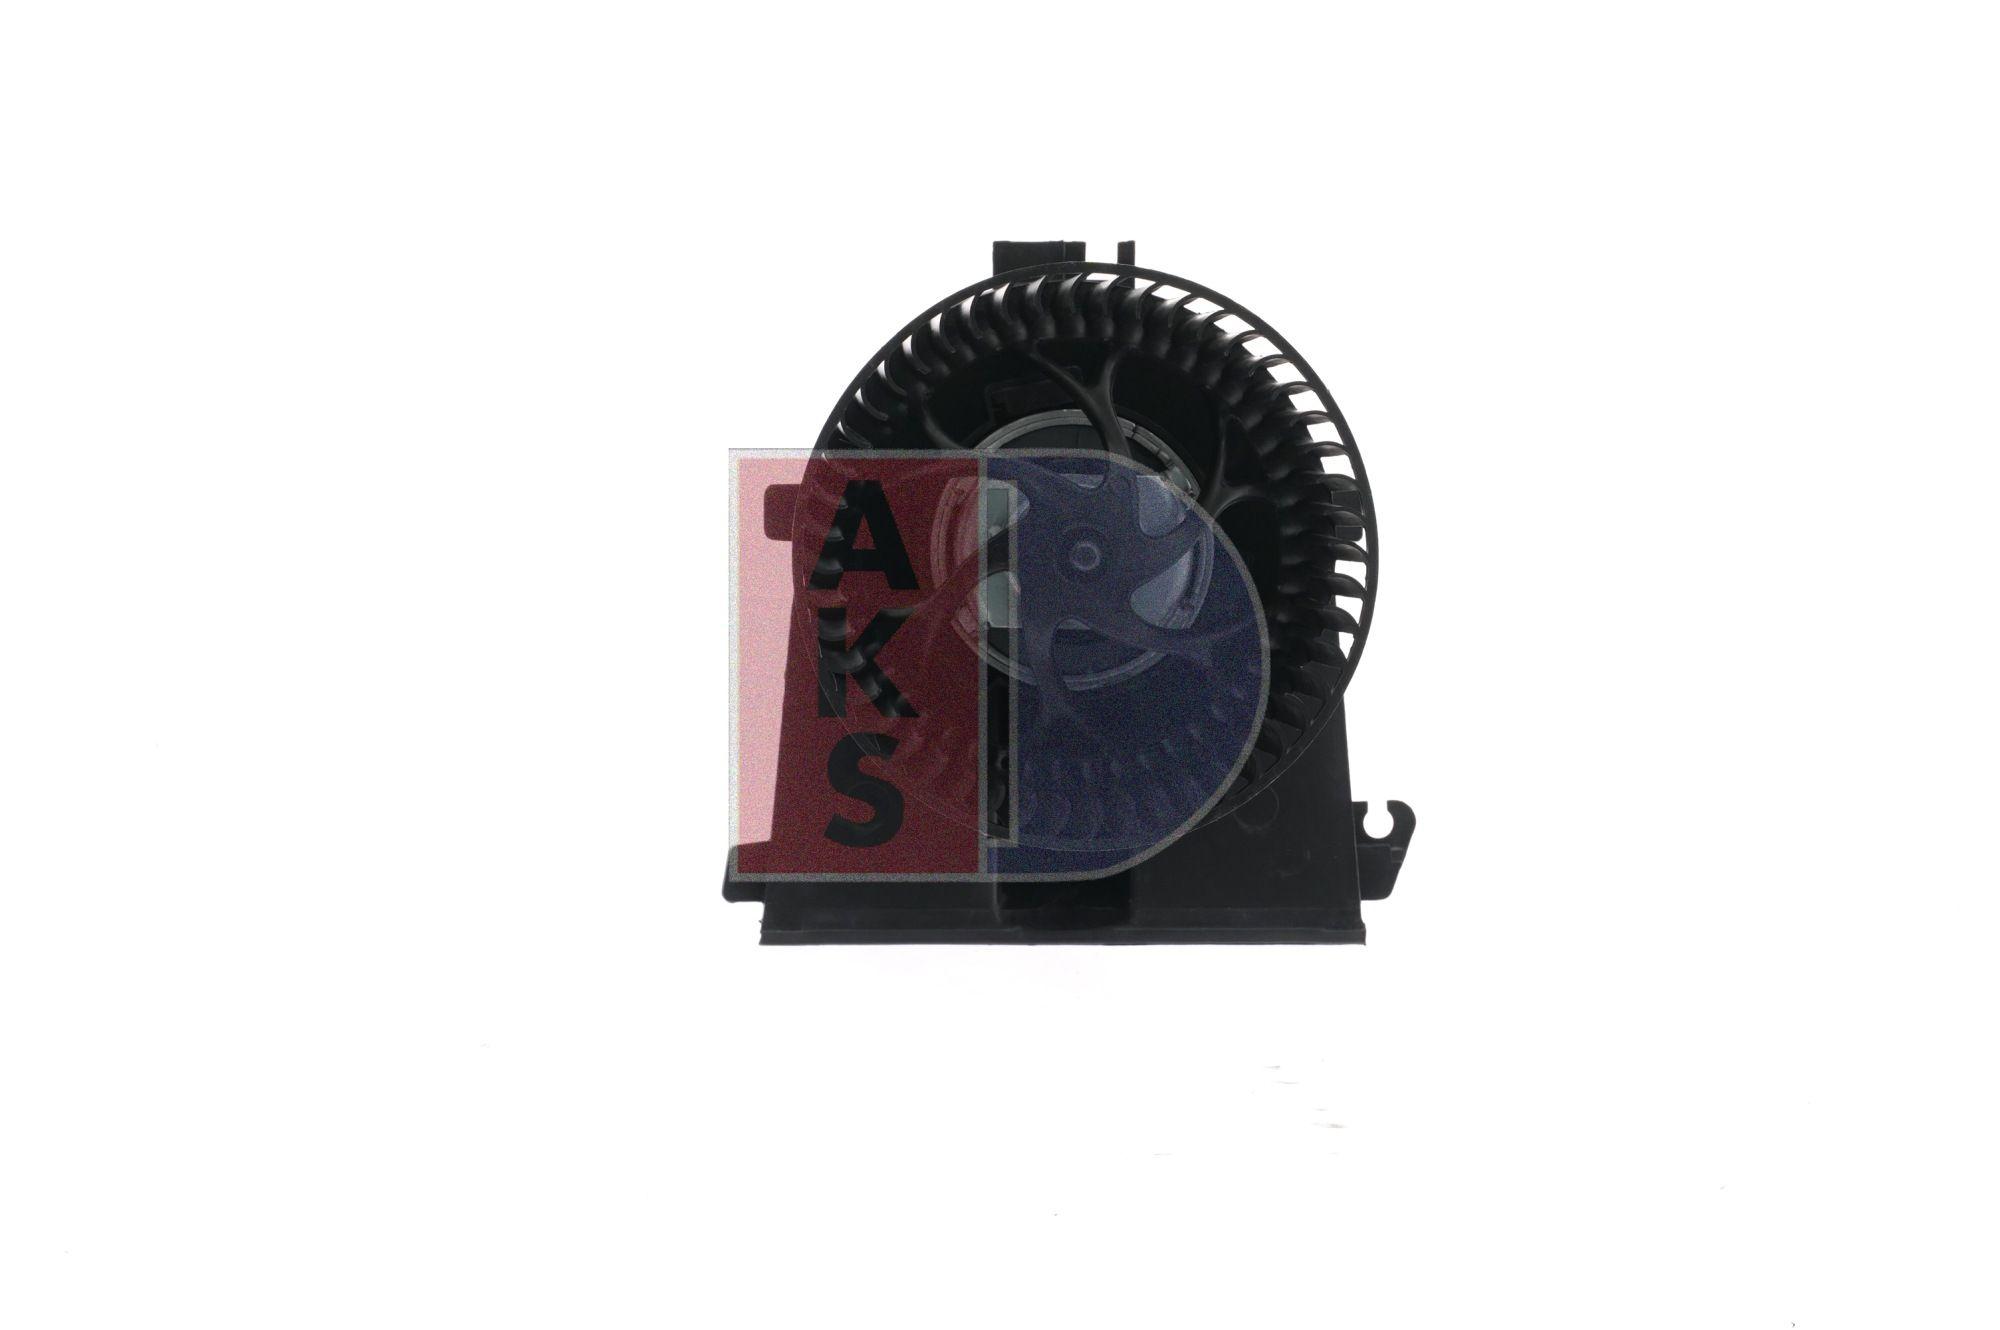 Heizgebläse 740934N AKS DASIS 740934N in Original Qualität